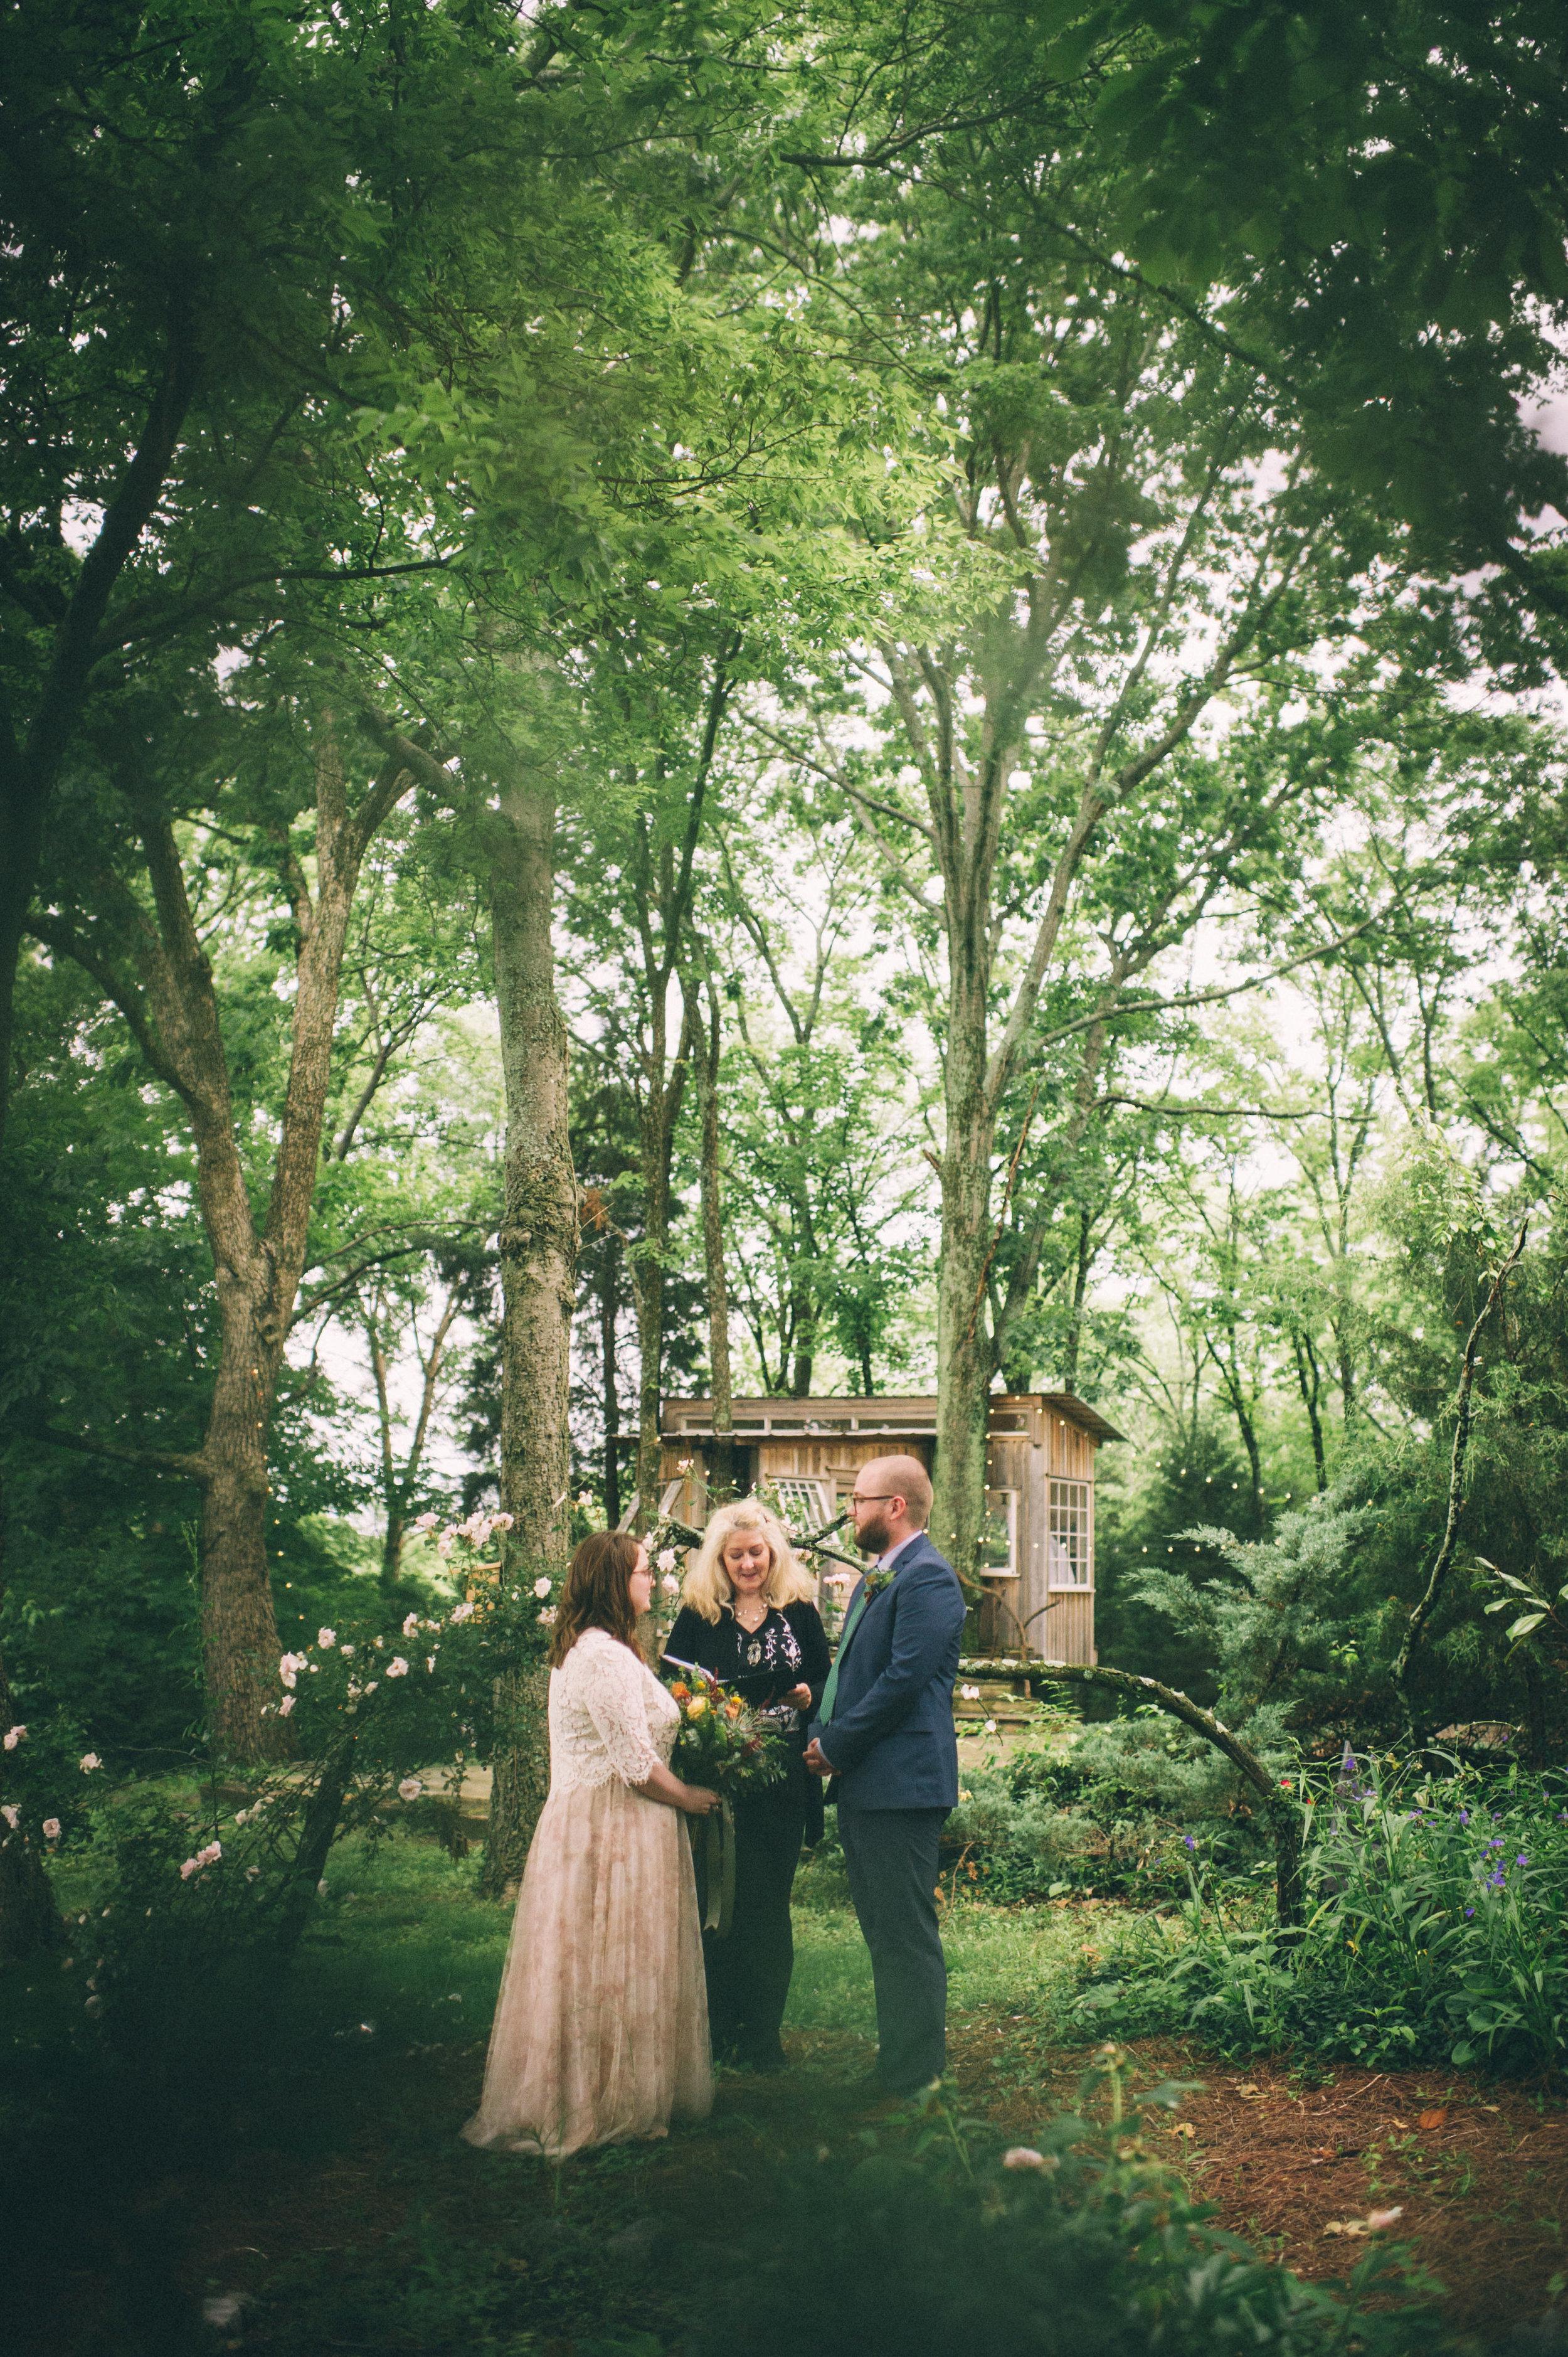 sarah-katherine-davis-photography-elopement-wedding-louisville-nashville-kentucky-photographer.jpg